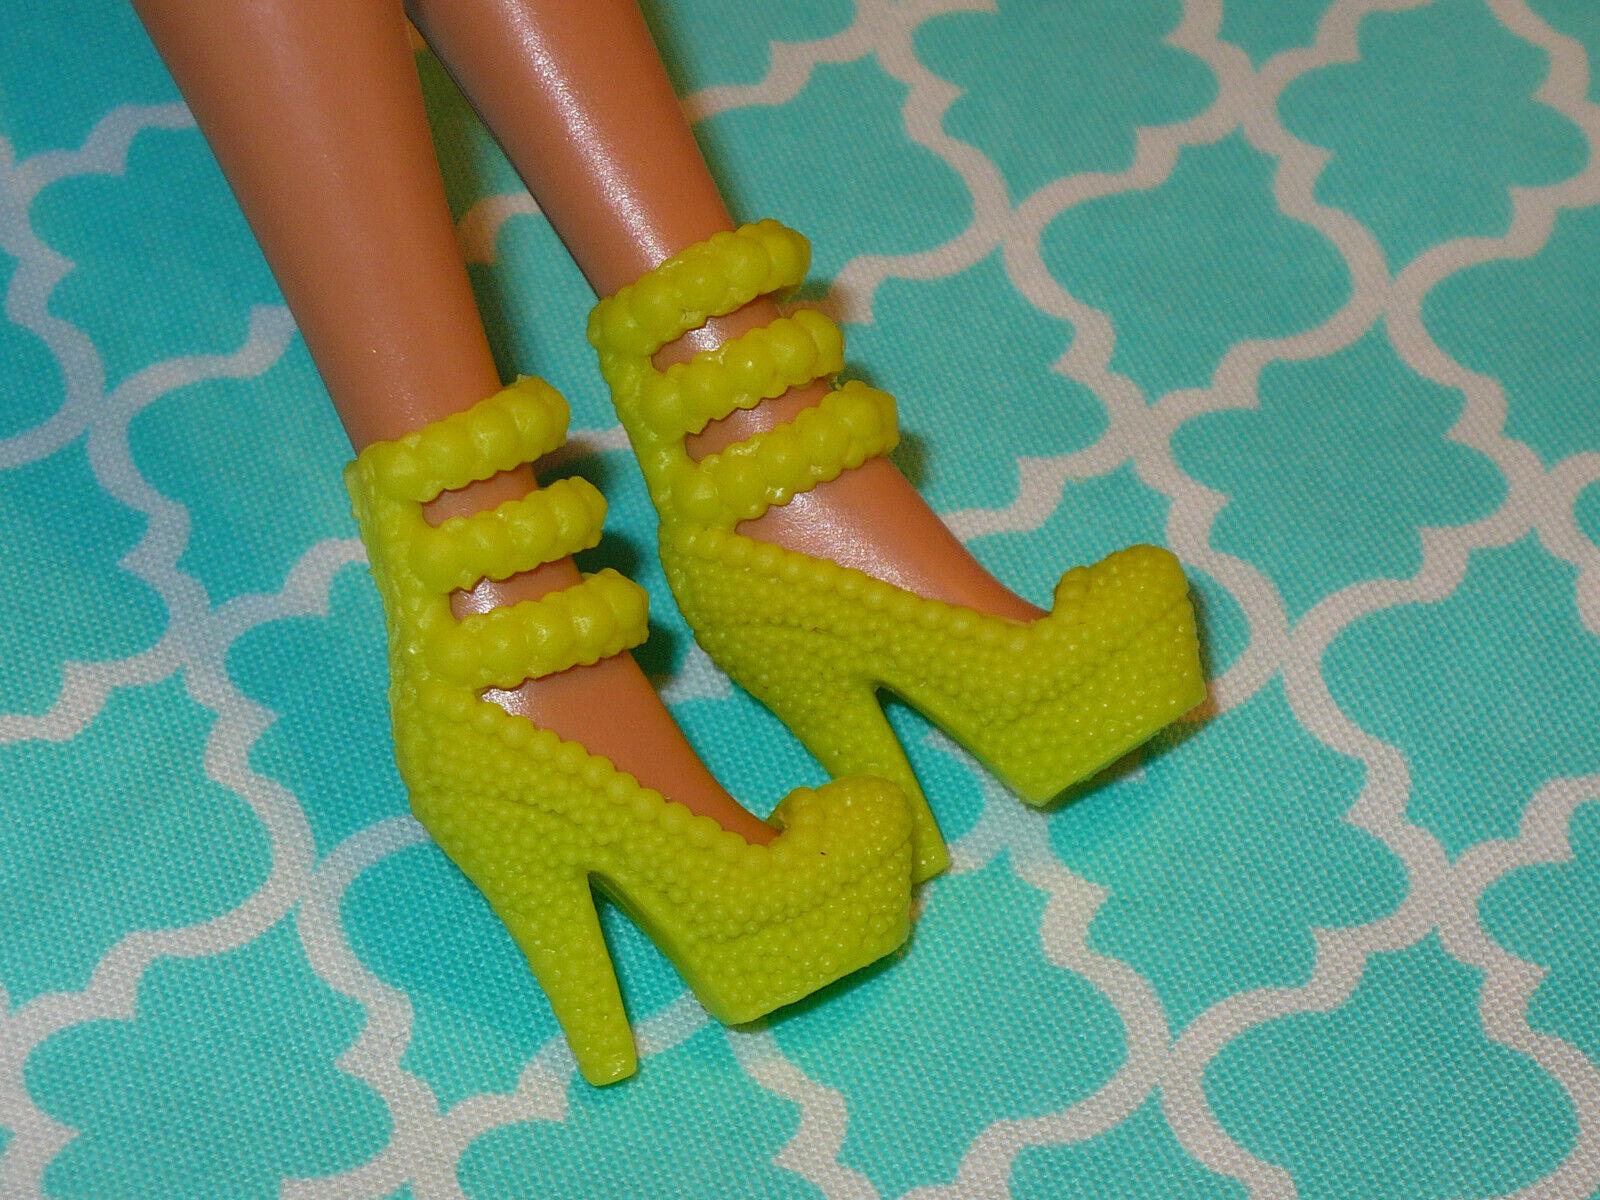 Mattel Barbie Doll Shoes FASHIONISTAS FASHION FEVER FANCY GREEN HIGH HEELS - $10.39